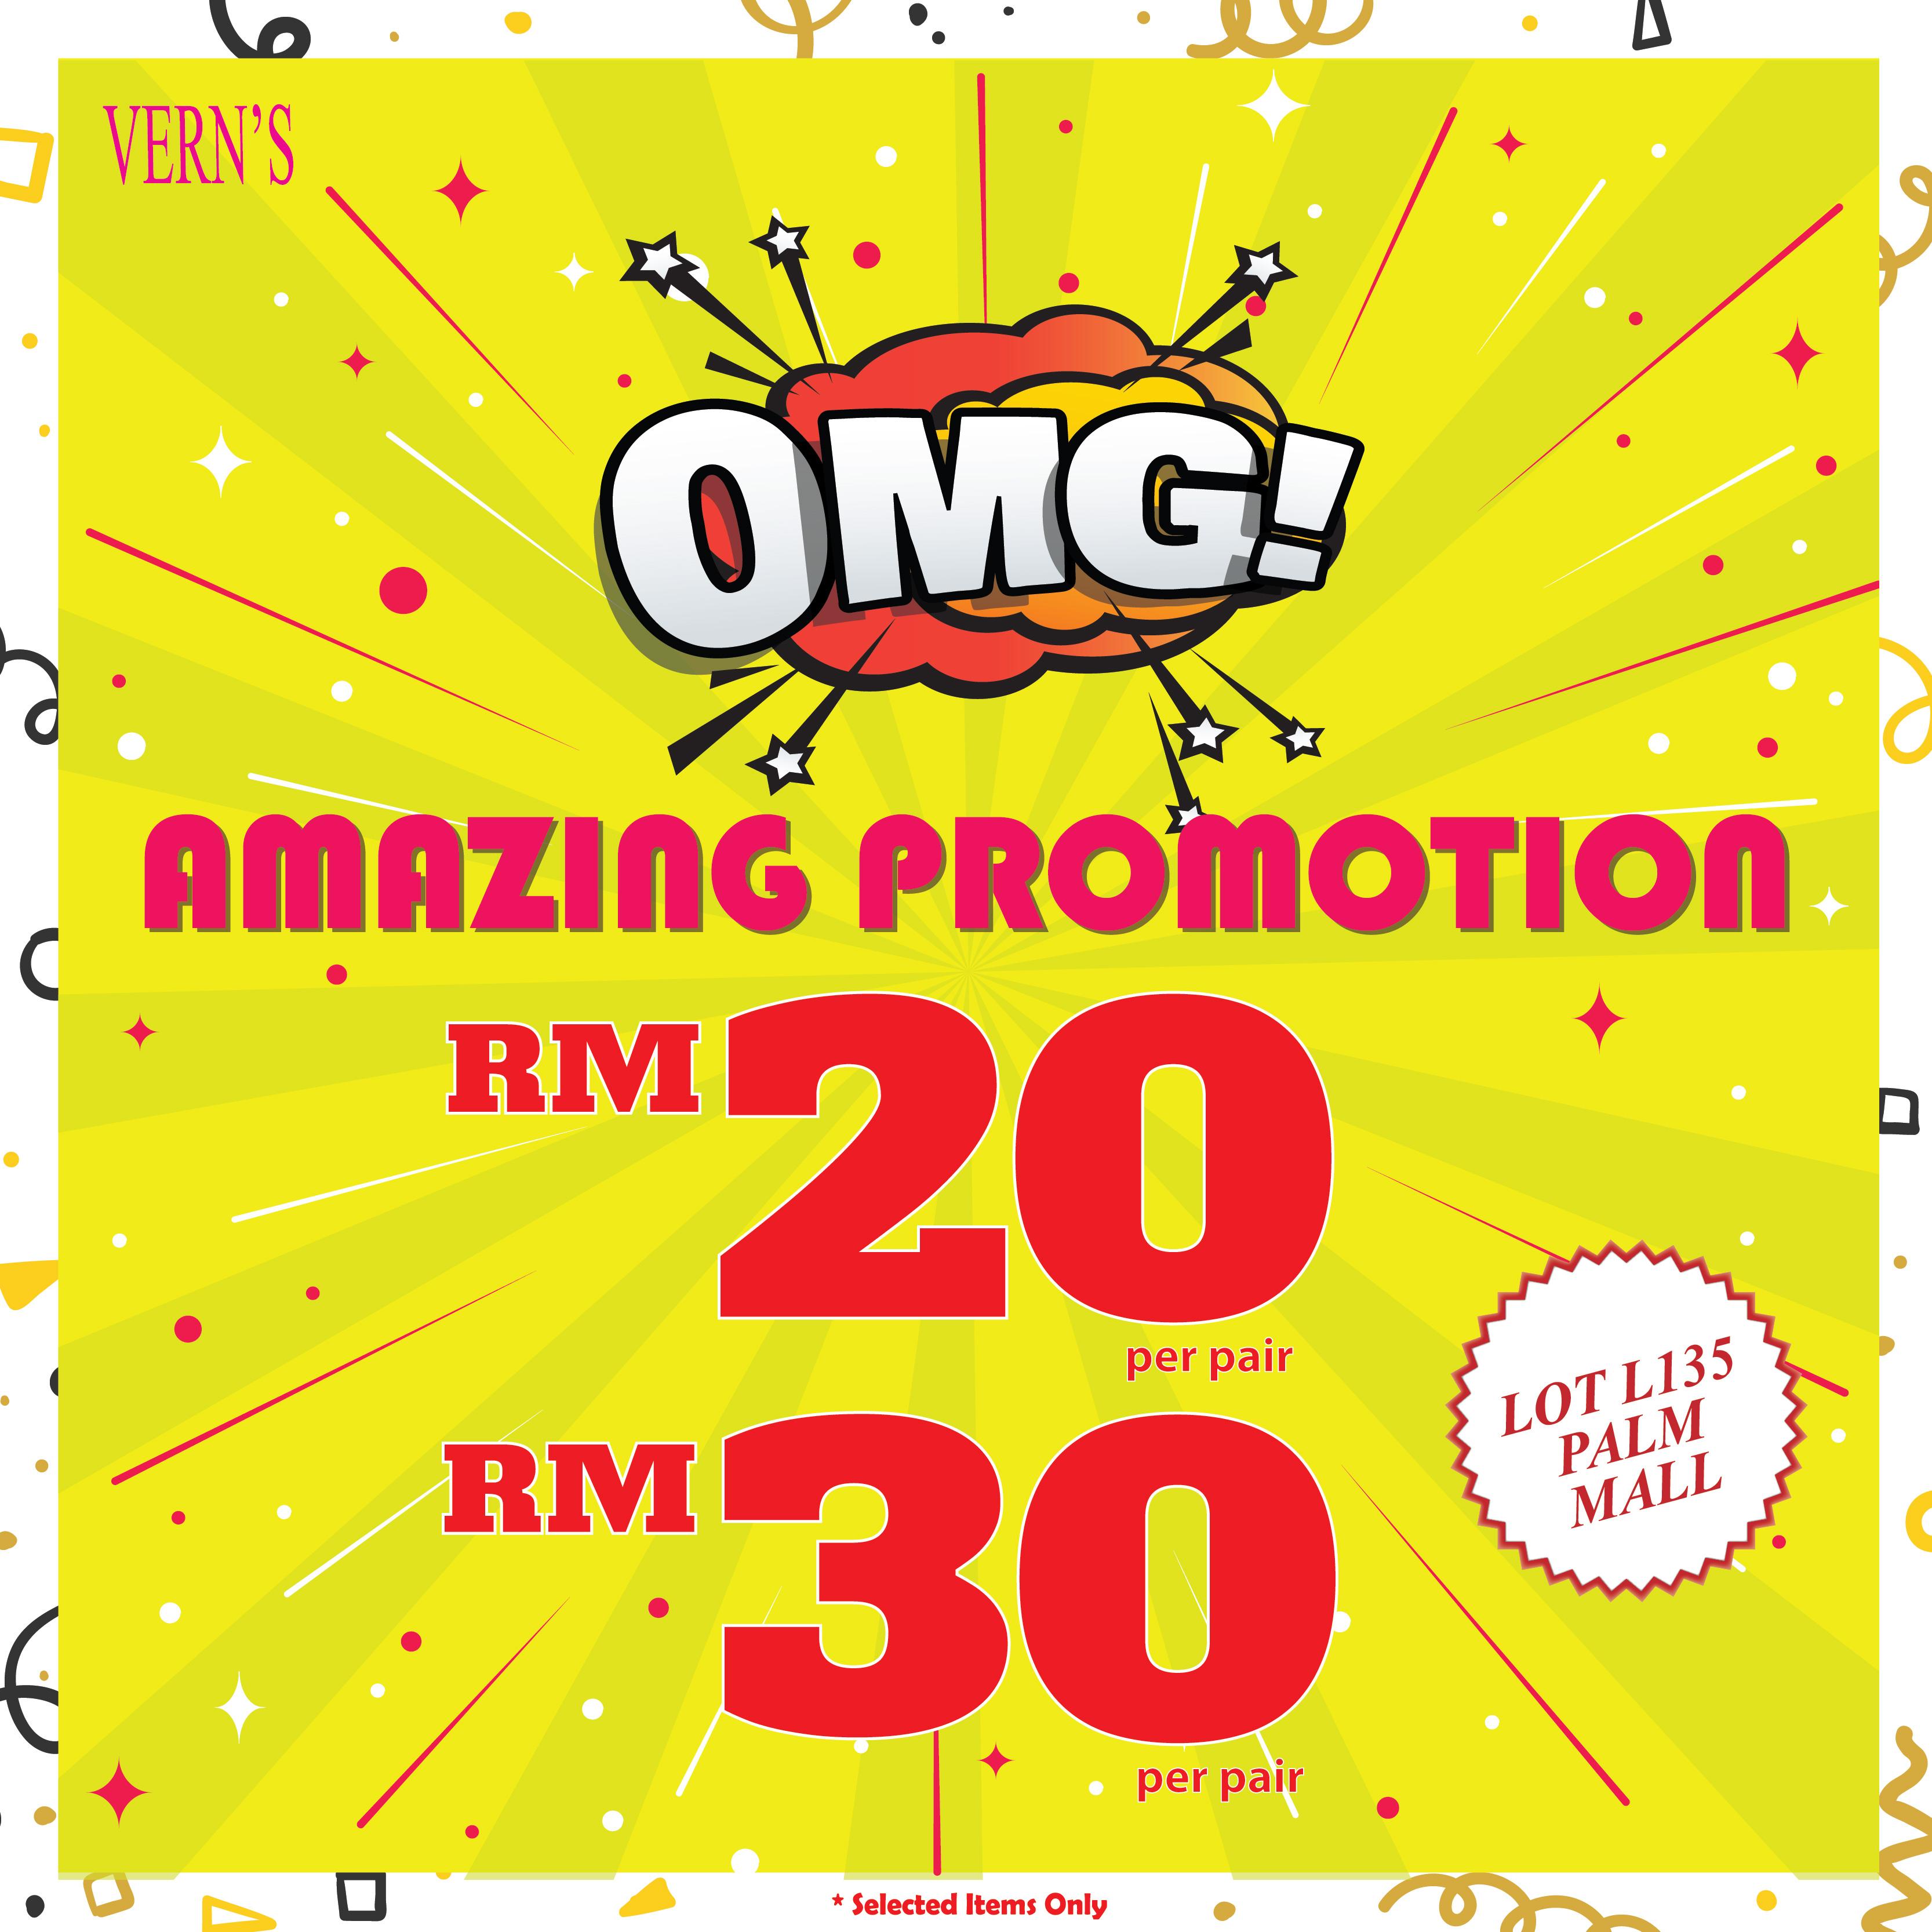 VERN'S Promotion